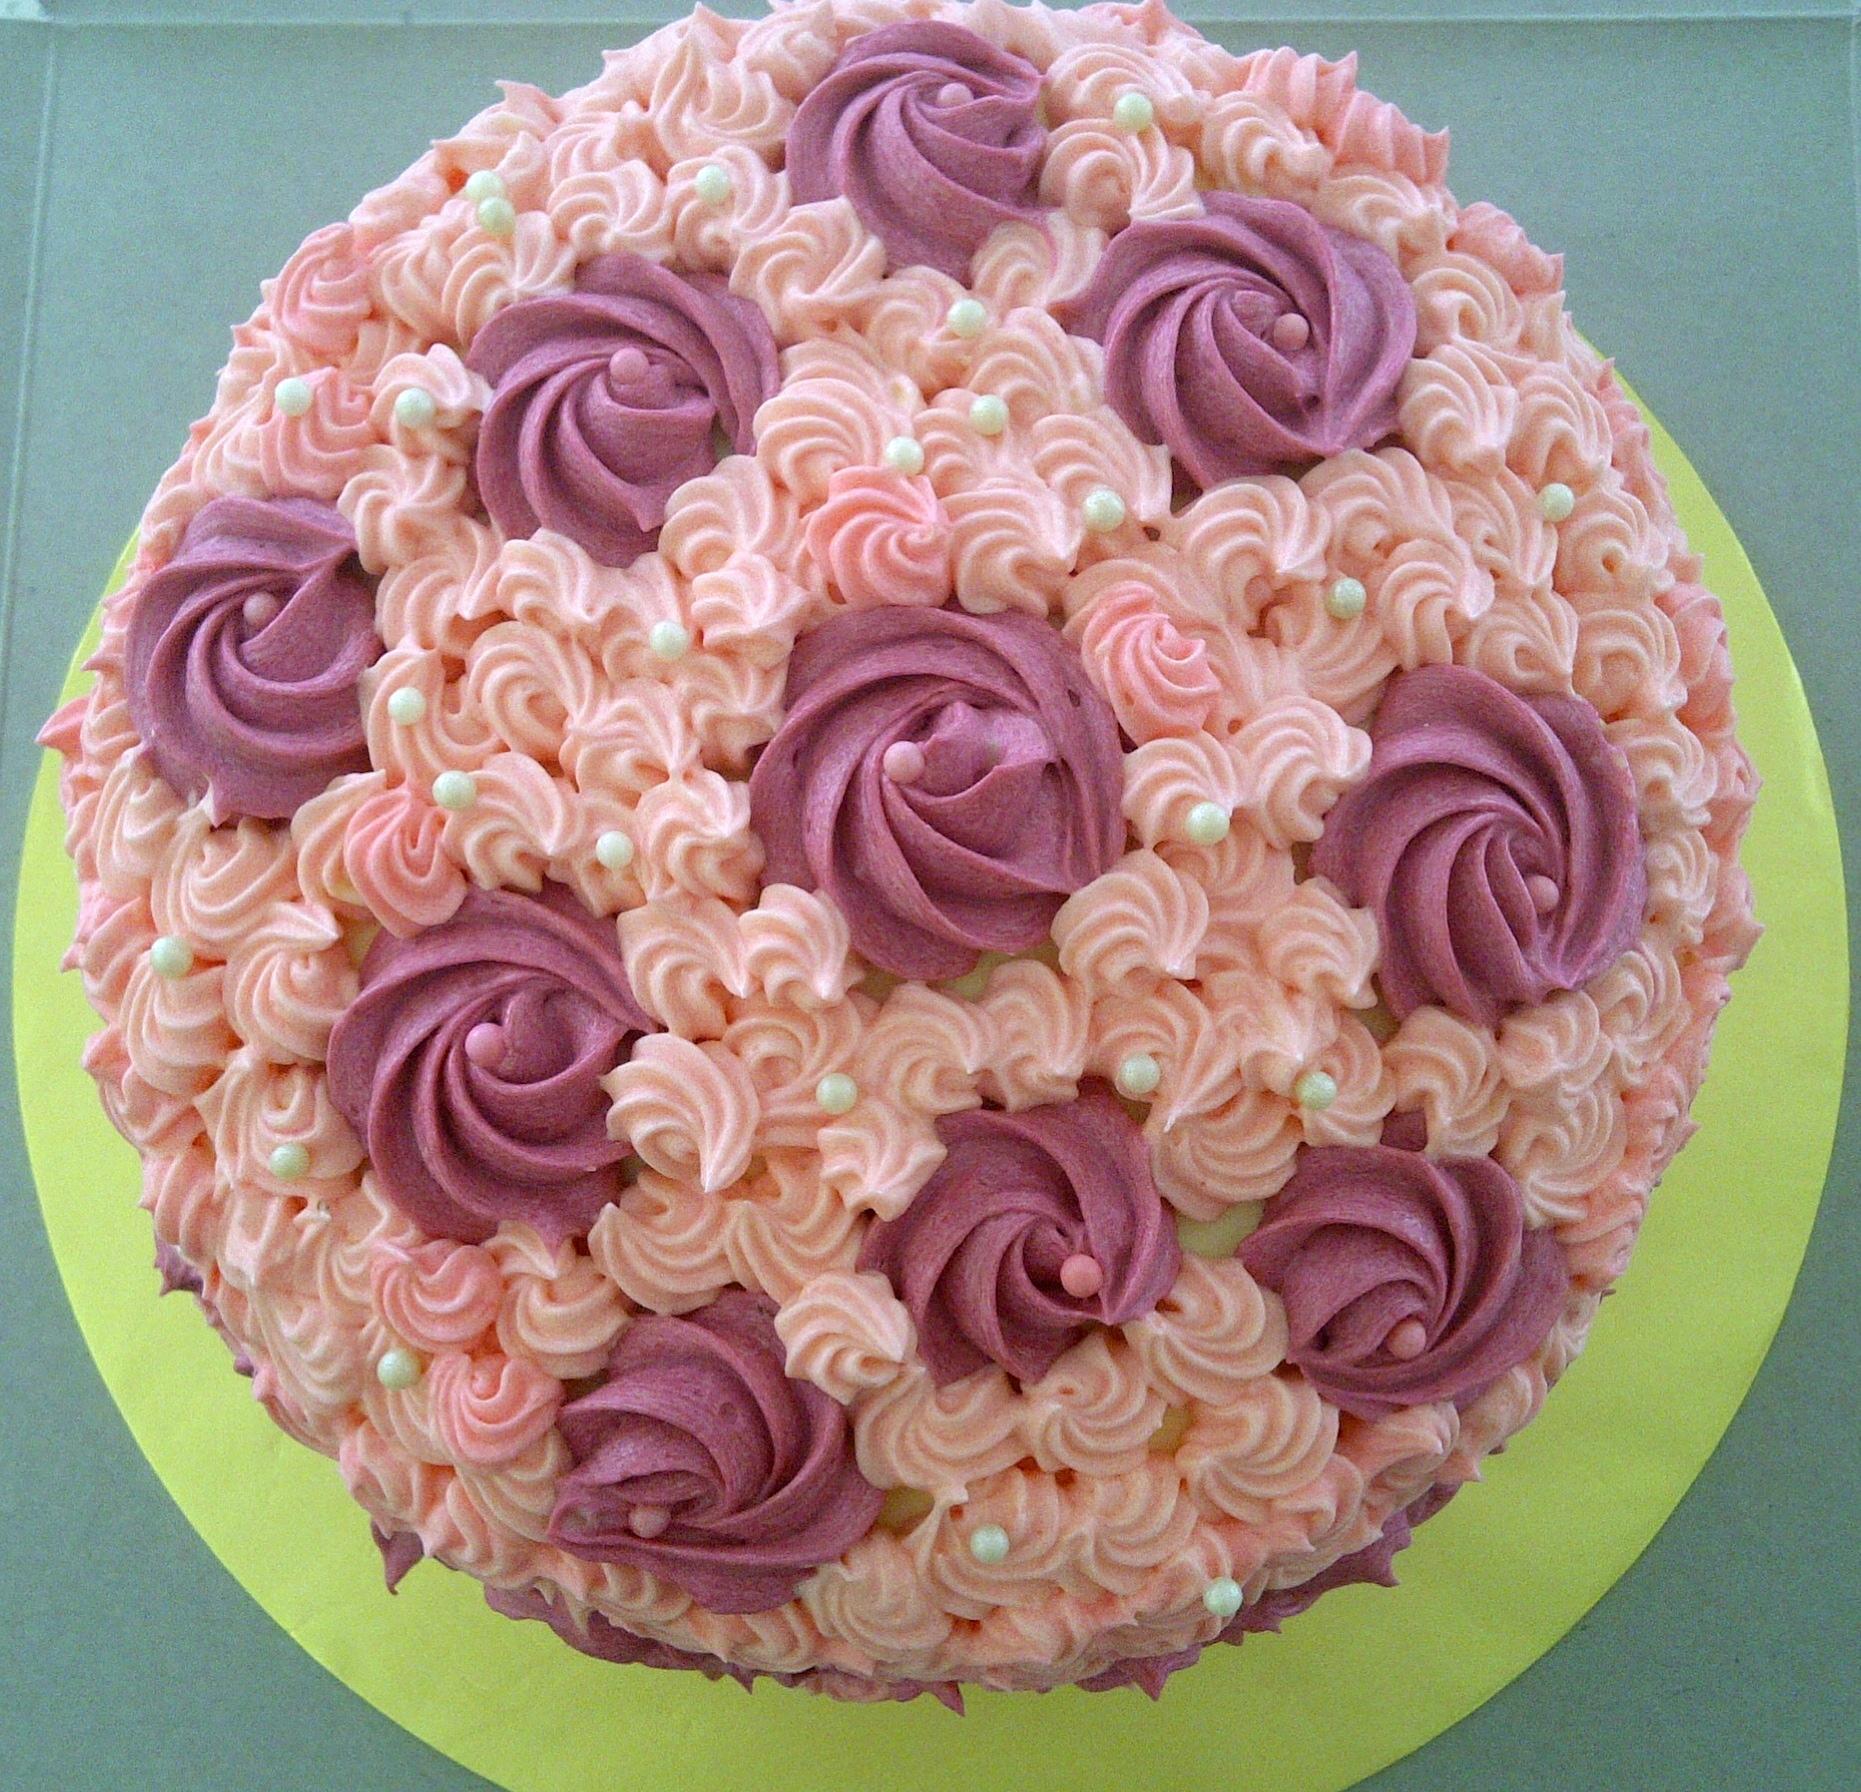 Hantaran rainbow cake with creamcheese toppng, flowery design.